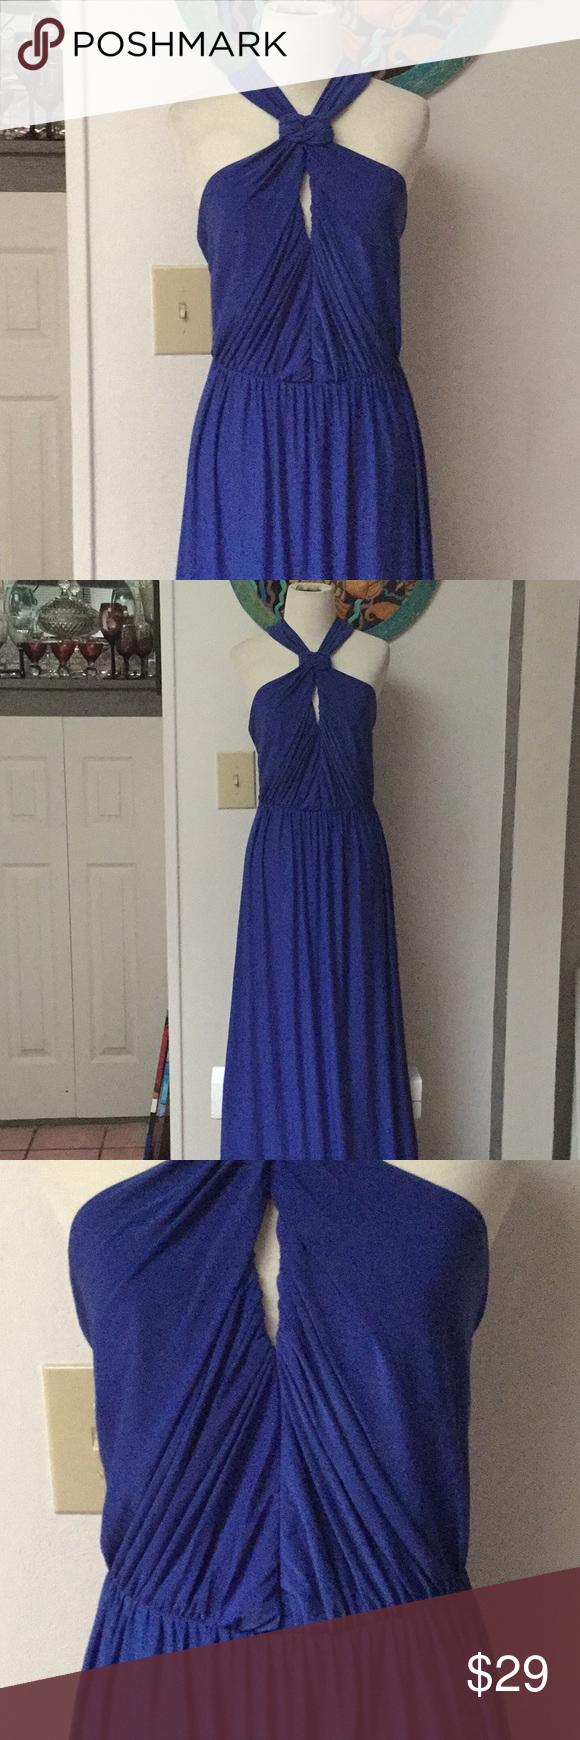 Dressbarn Cobalt Blue Maxi Dress Size 14 Maxi Dress Blue Size 14 Dresses Clothes Design [ 1740 x 580 Pixel ]